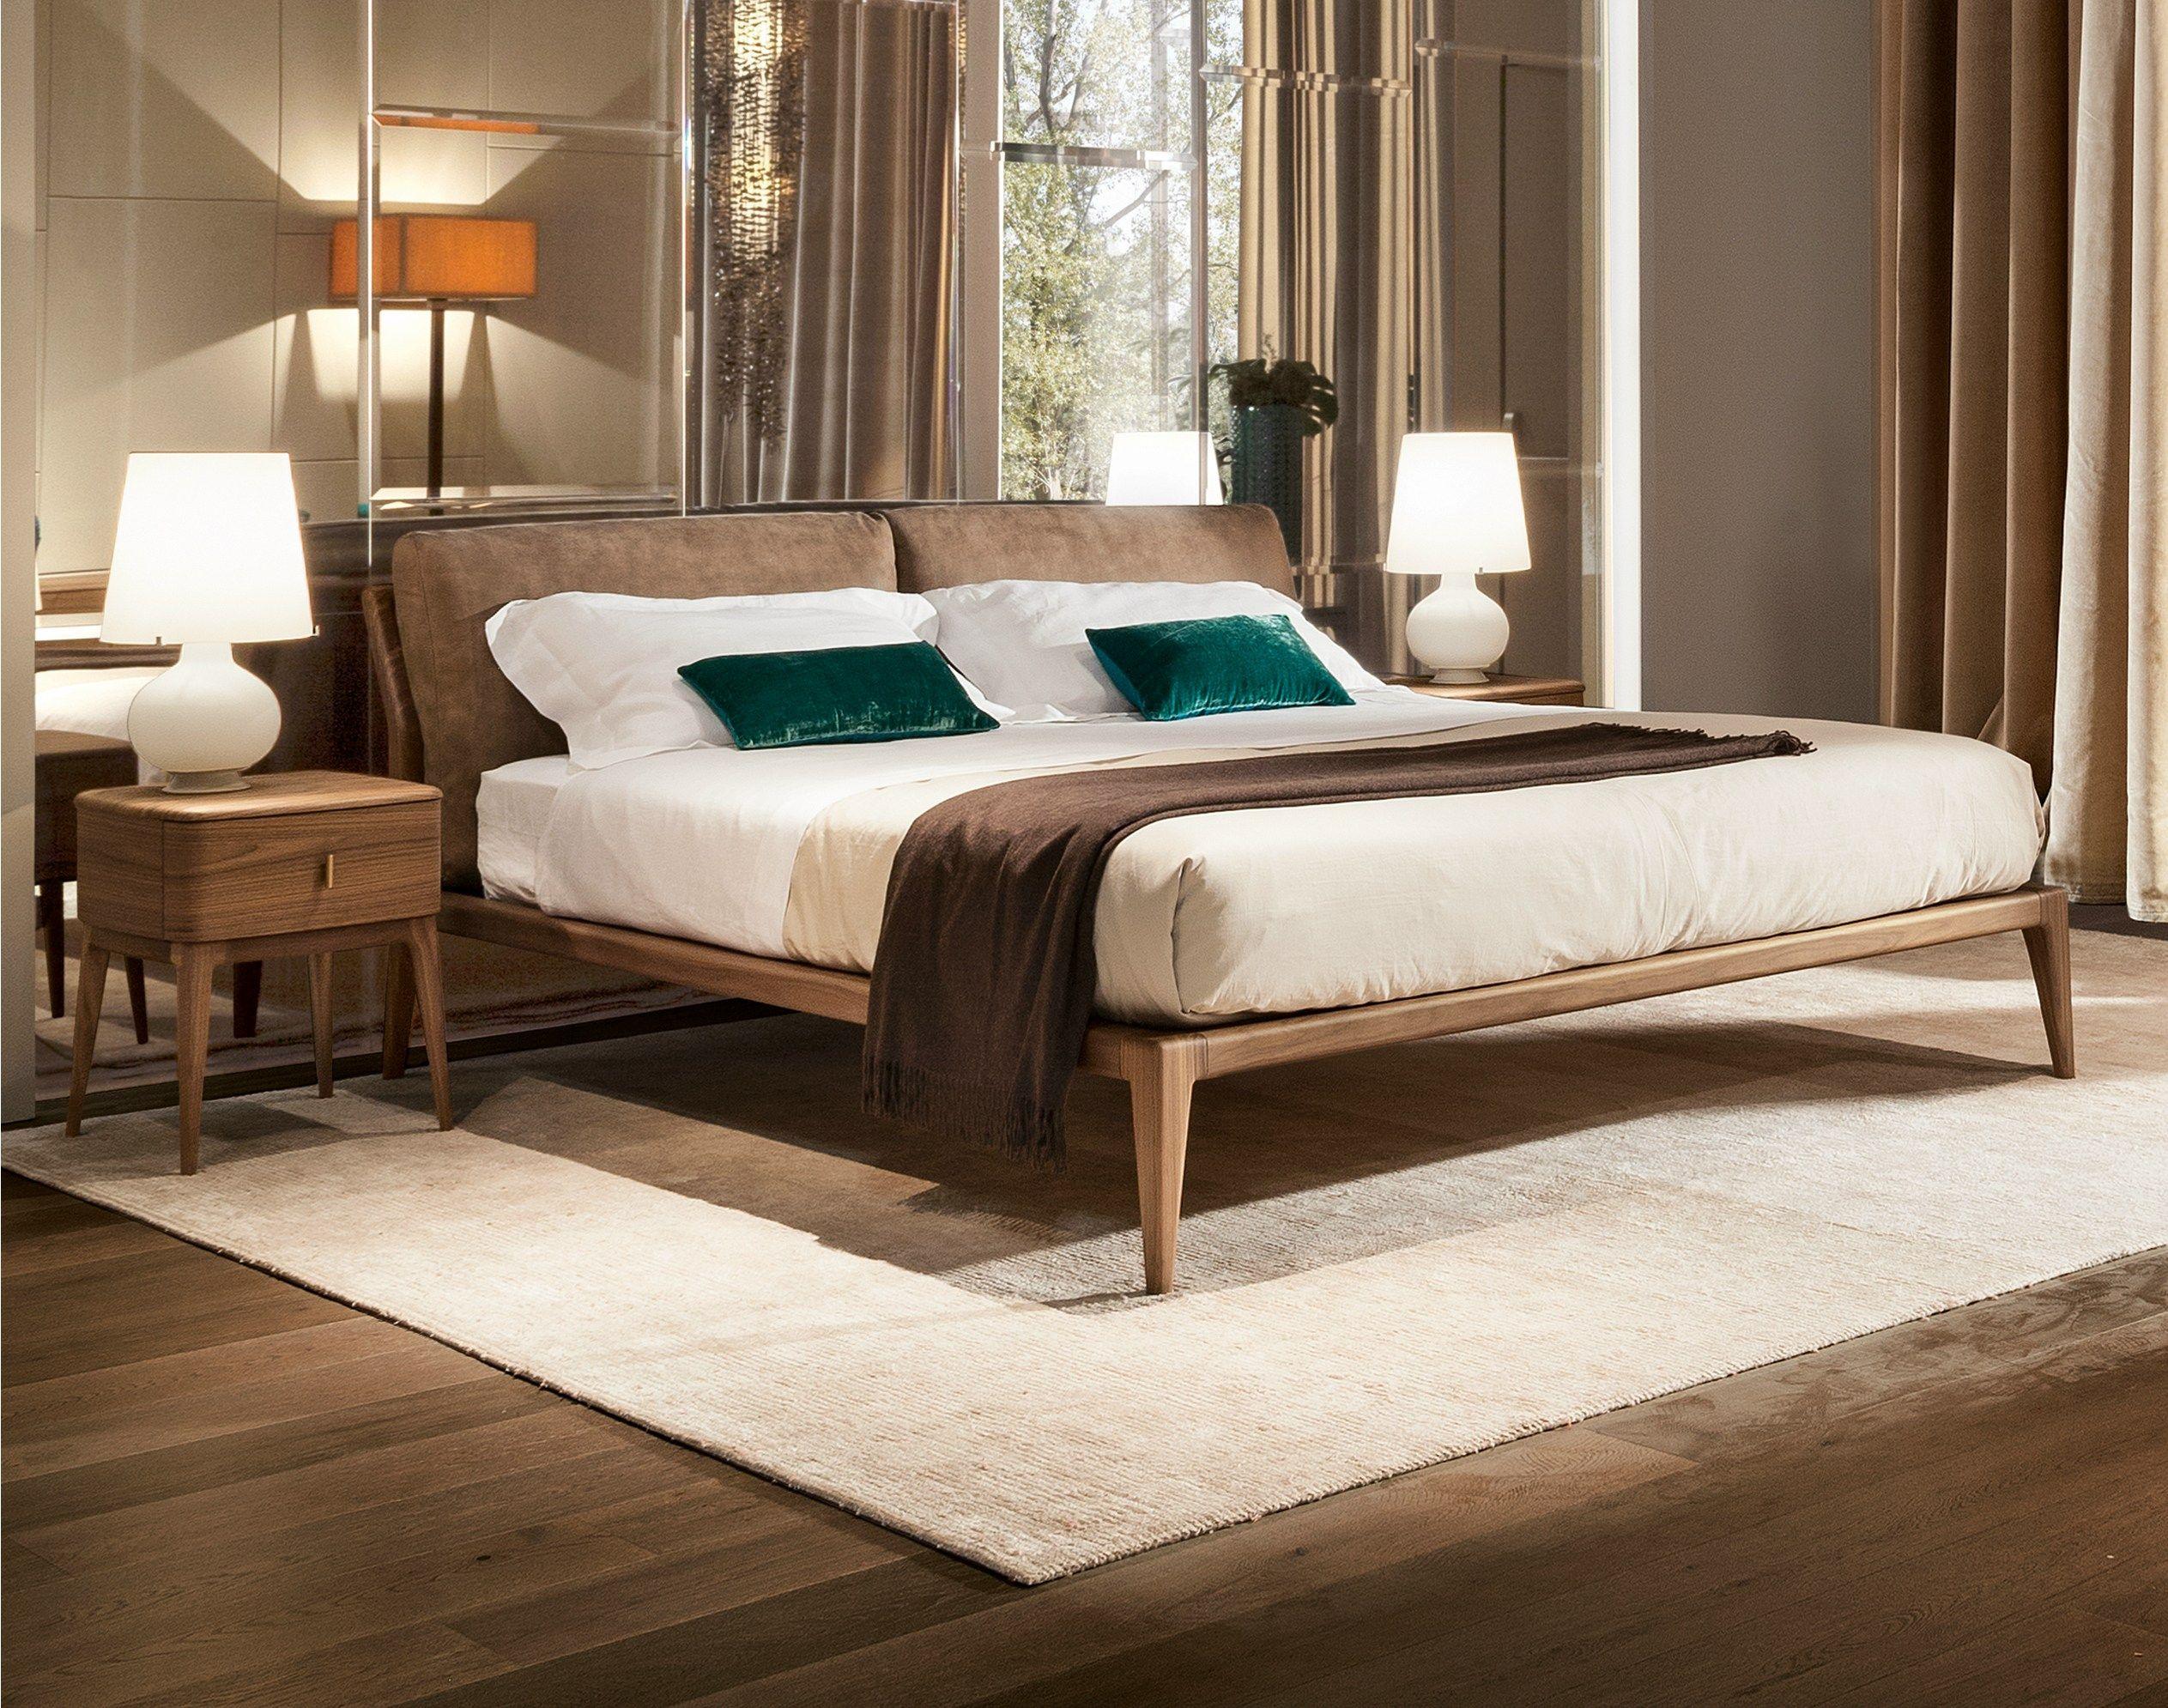 Indigo Double Bed By Selva Design Leonardo Dainelli